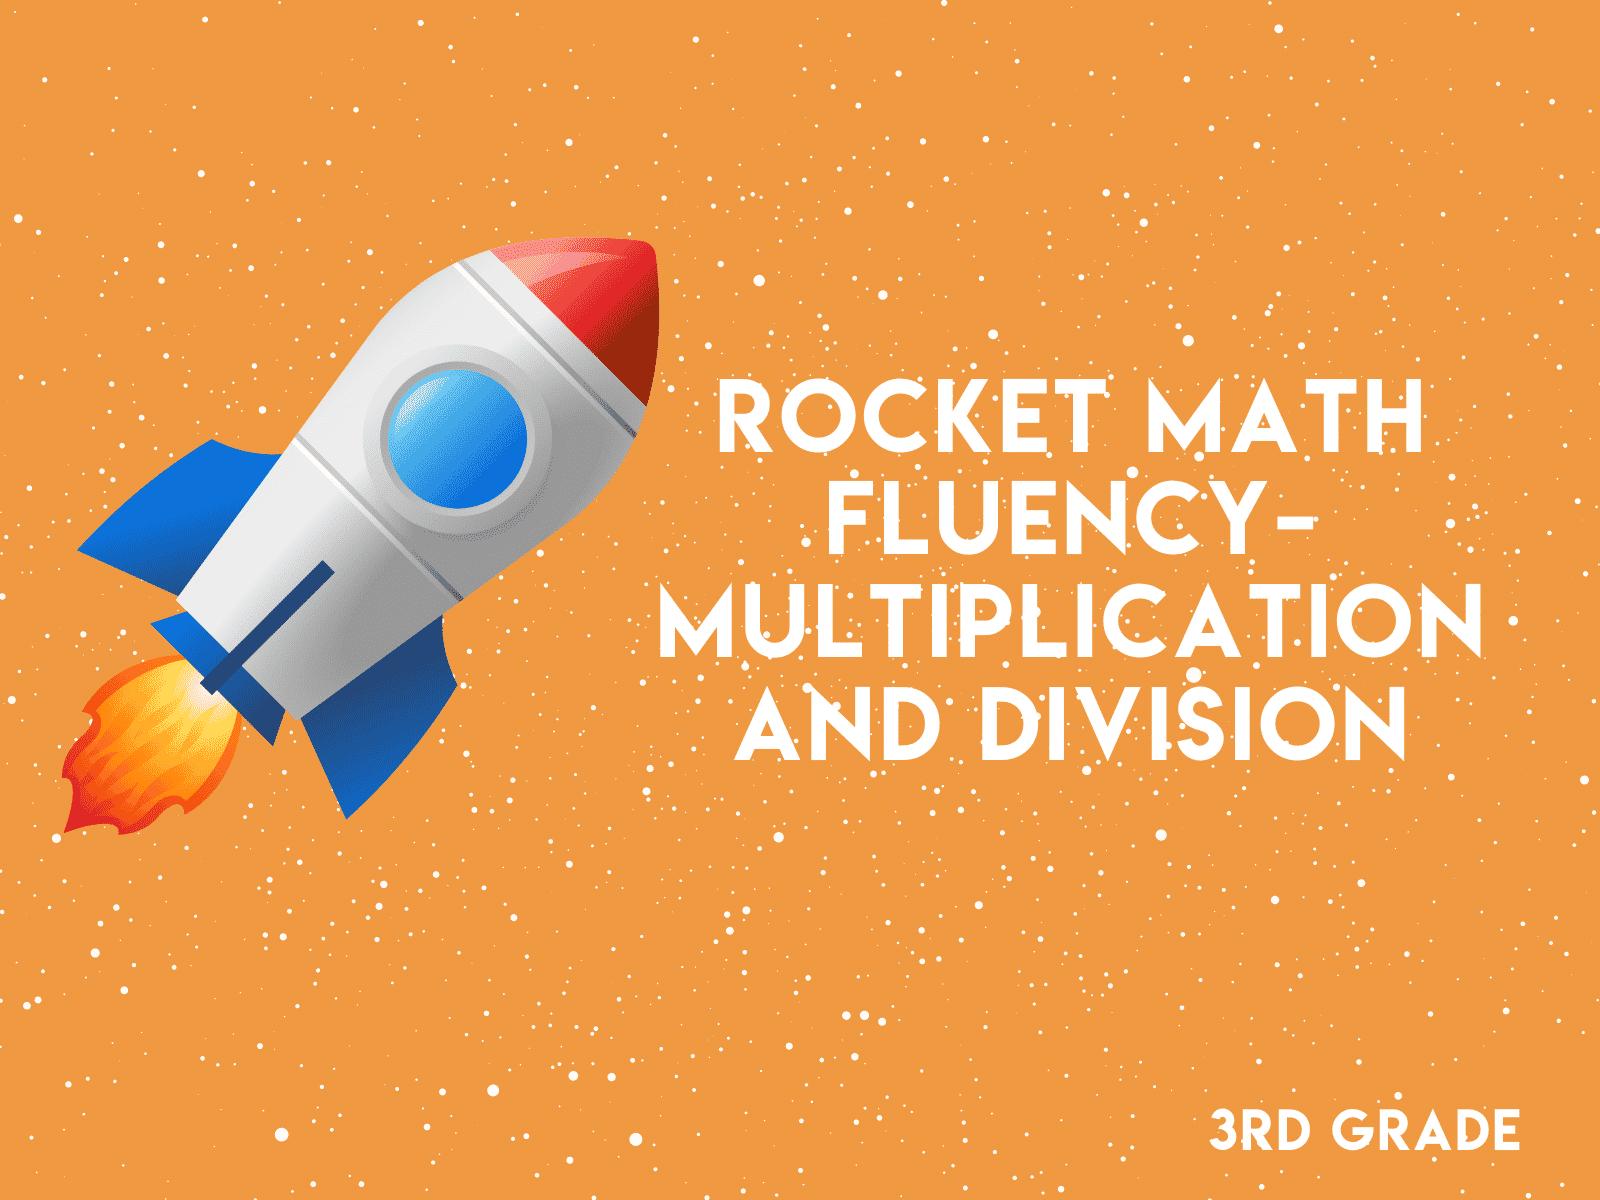 3rd Grade - Rocket Math Fluency